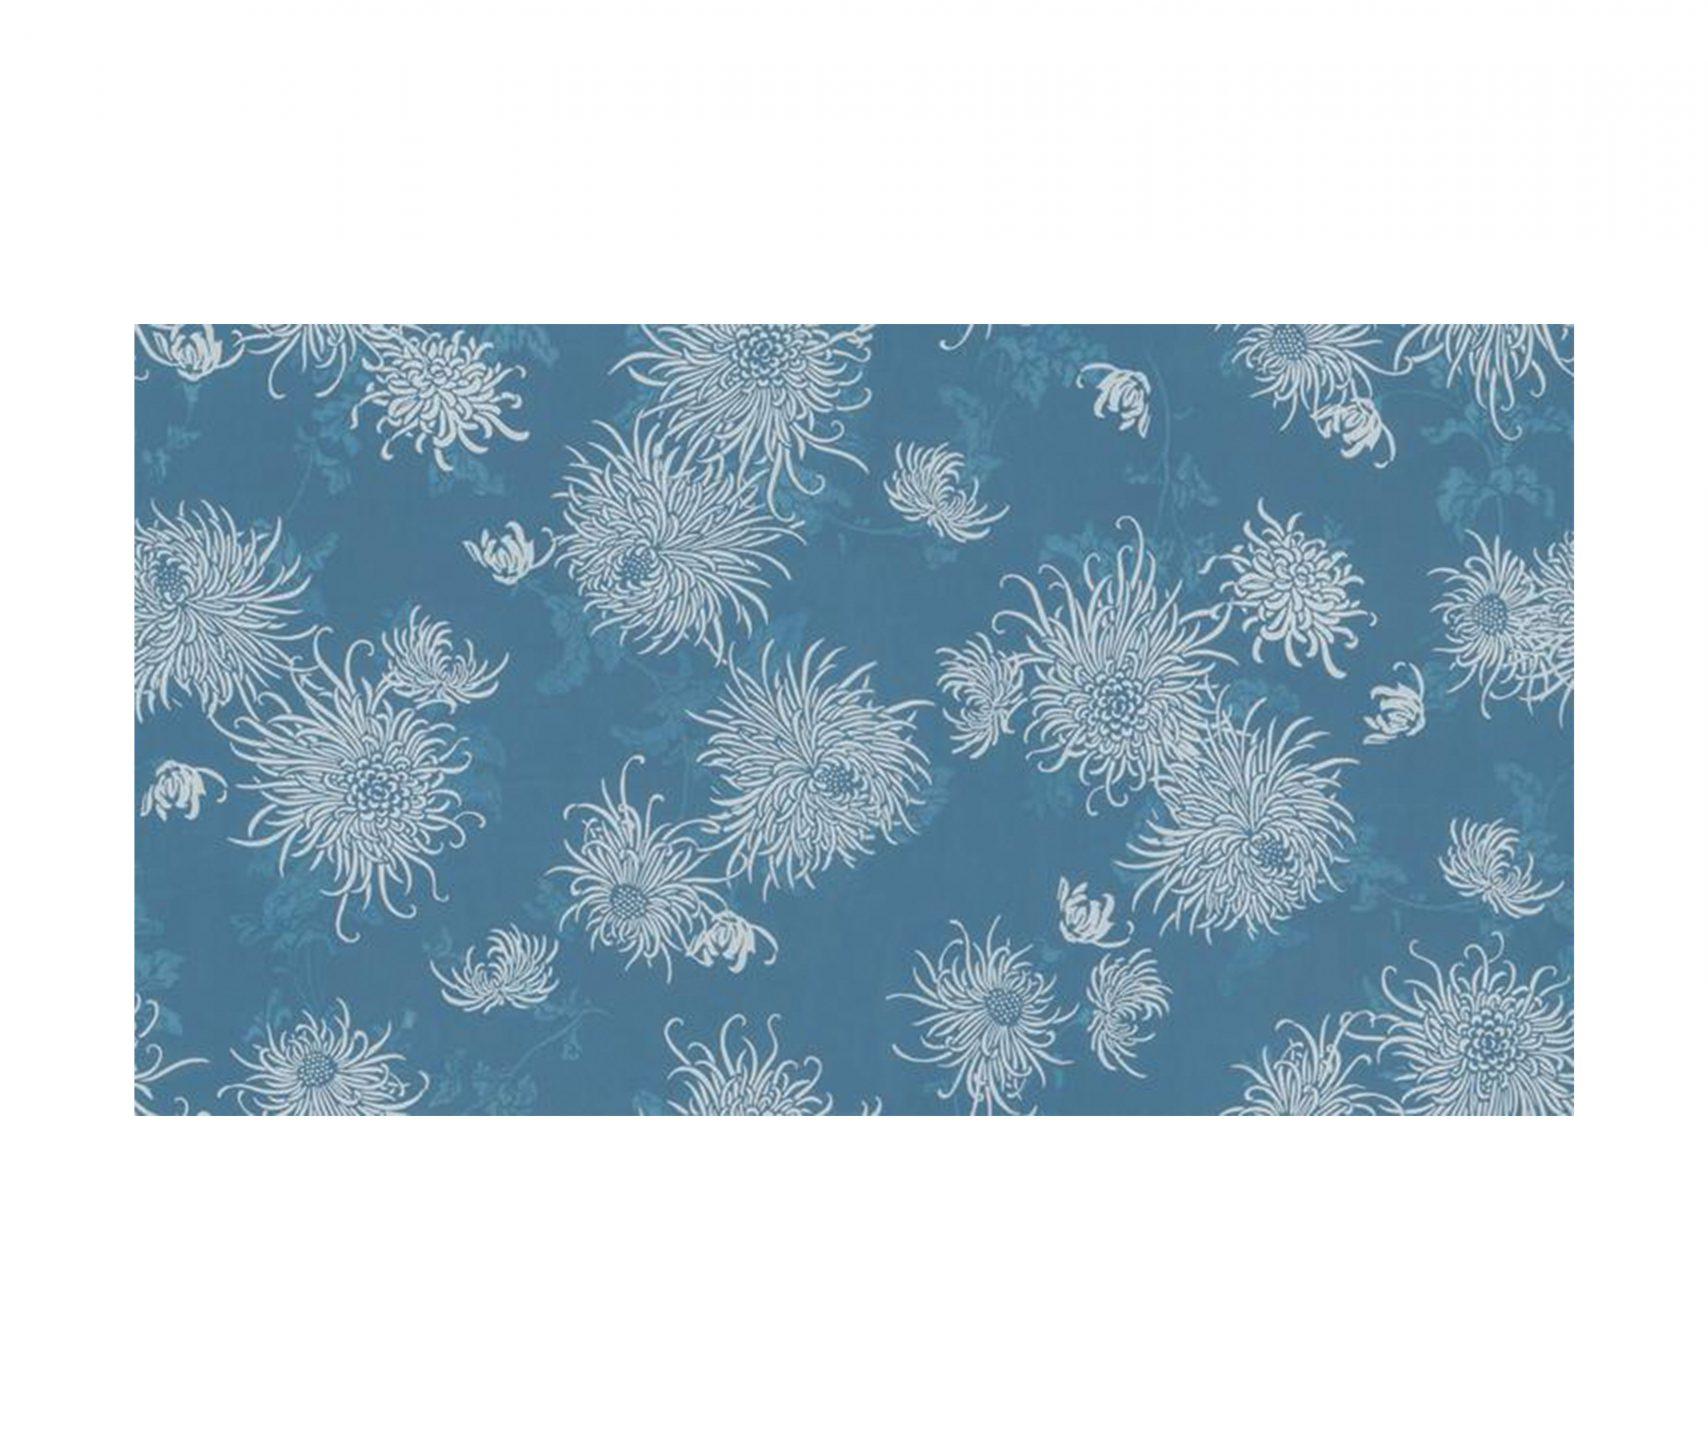 Profiles_Chrysanthemum-Wallpaper-1_int_products